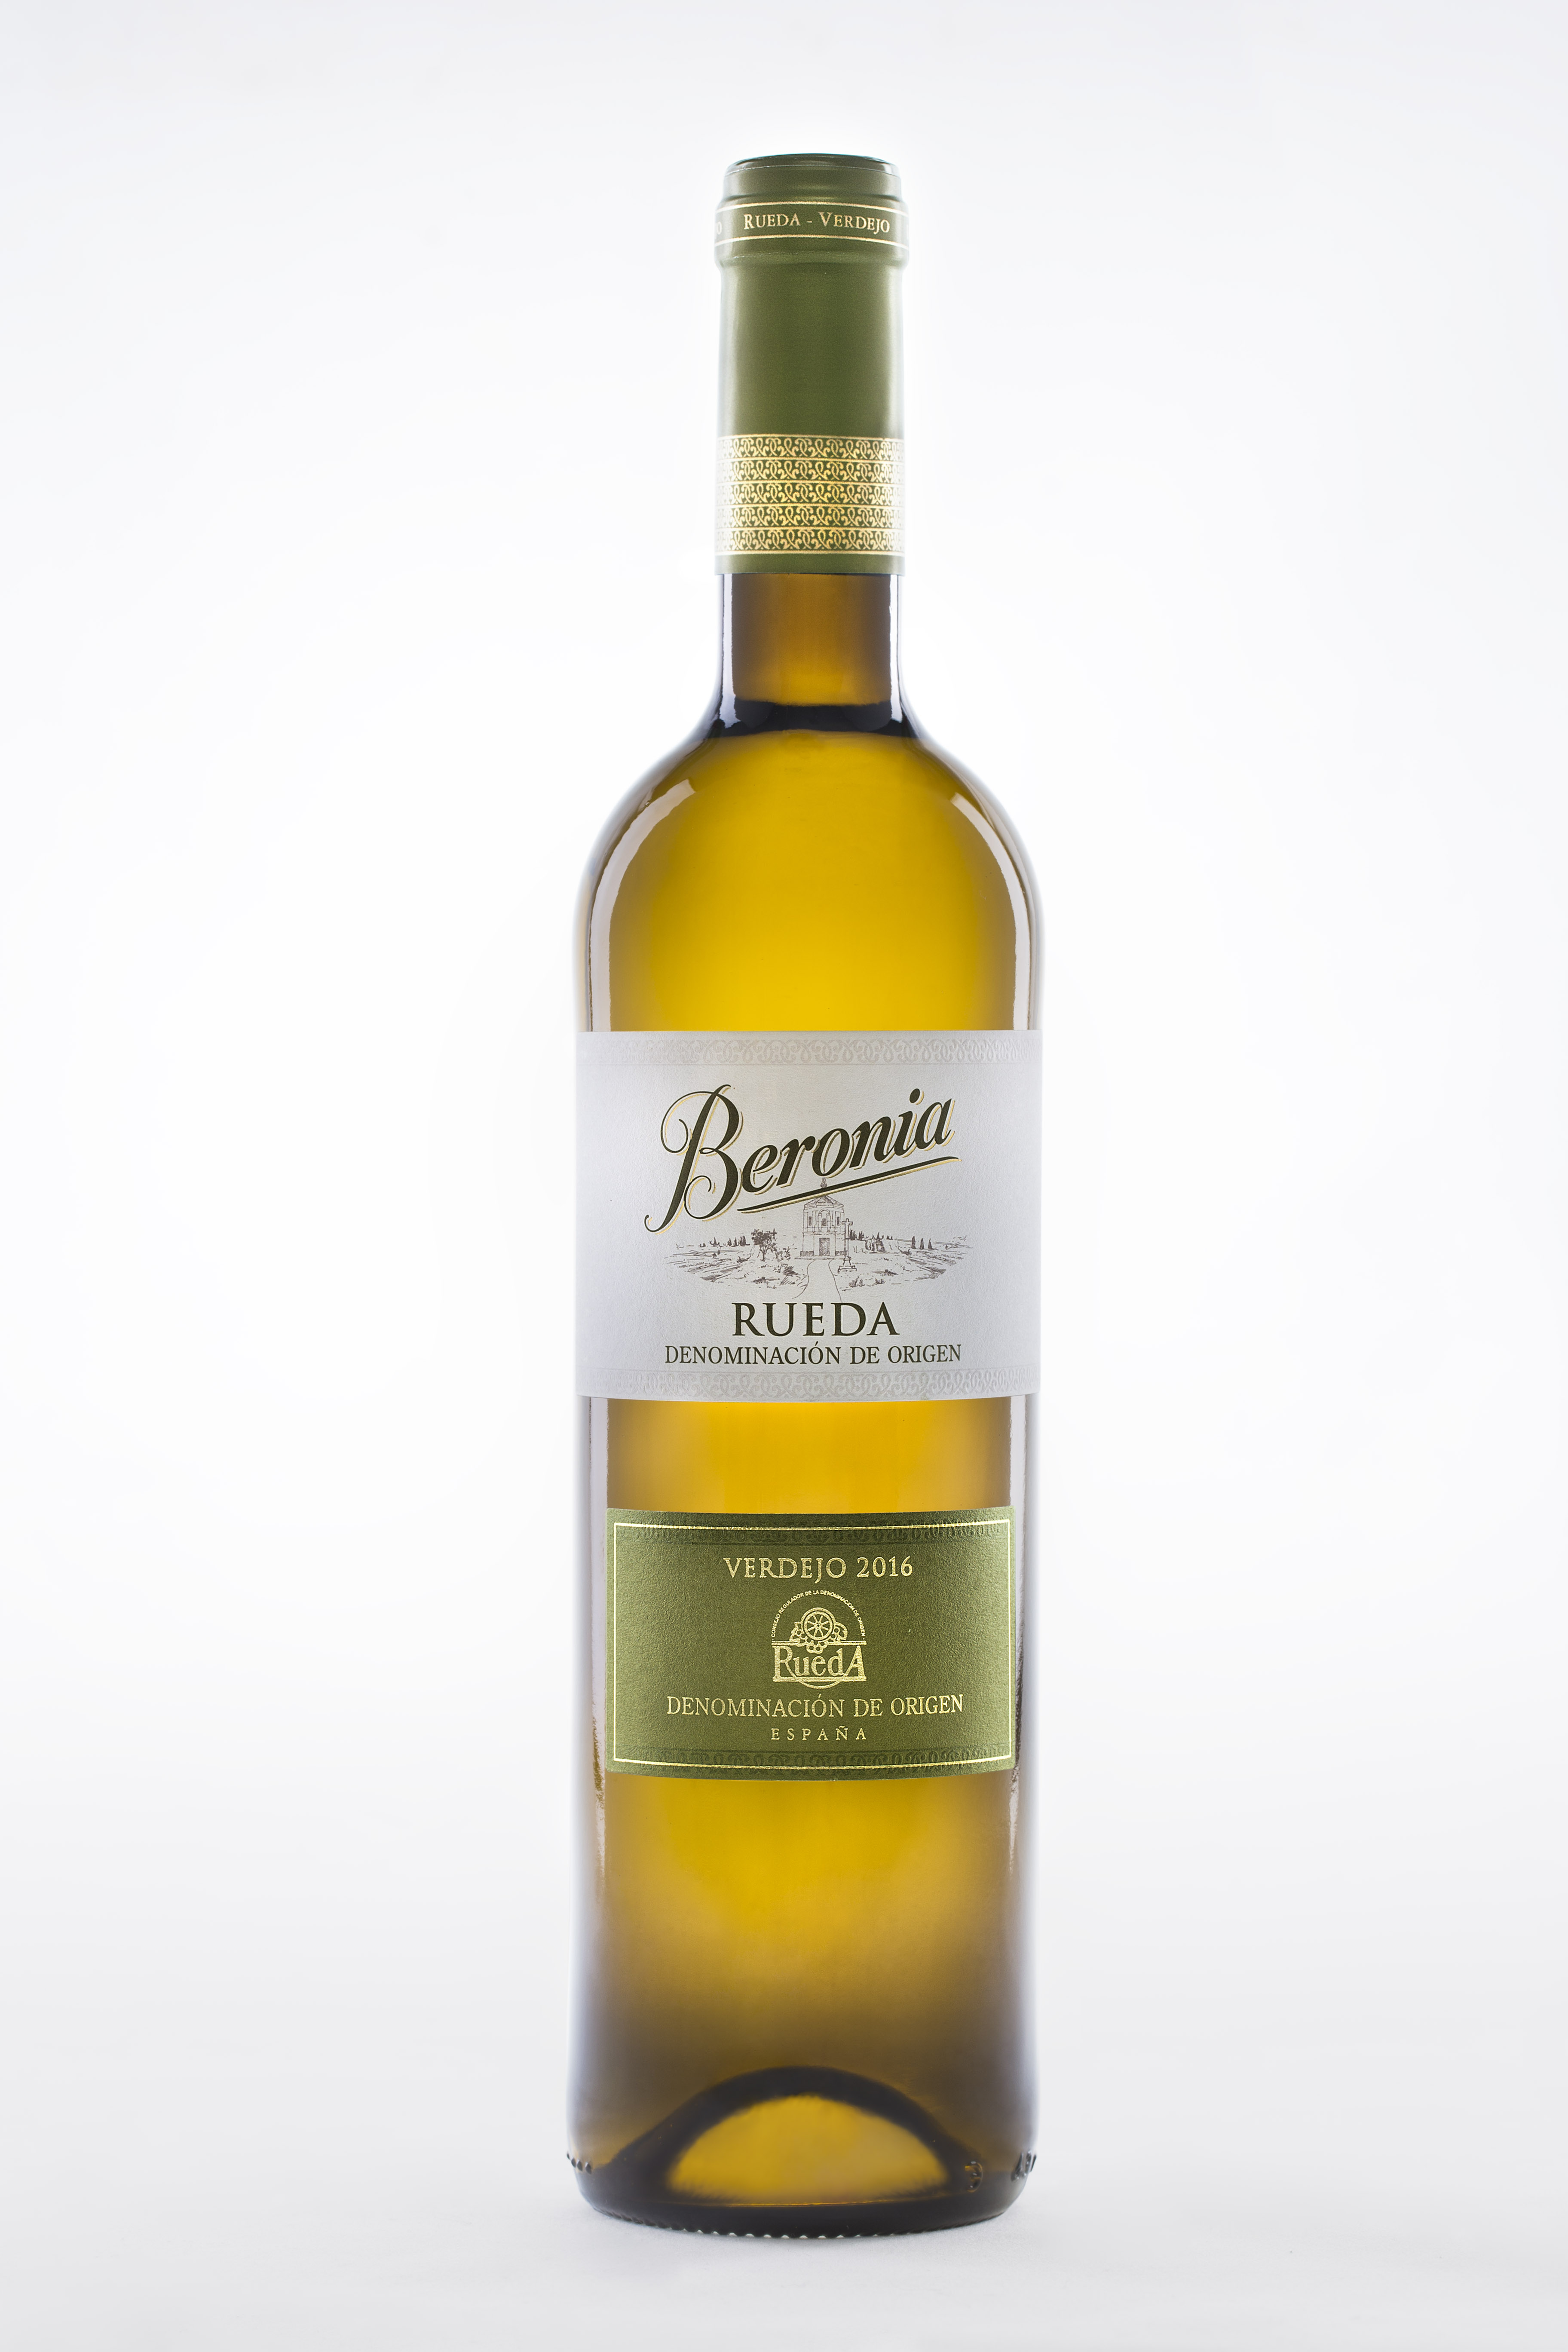 Beronia Rueda